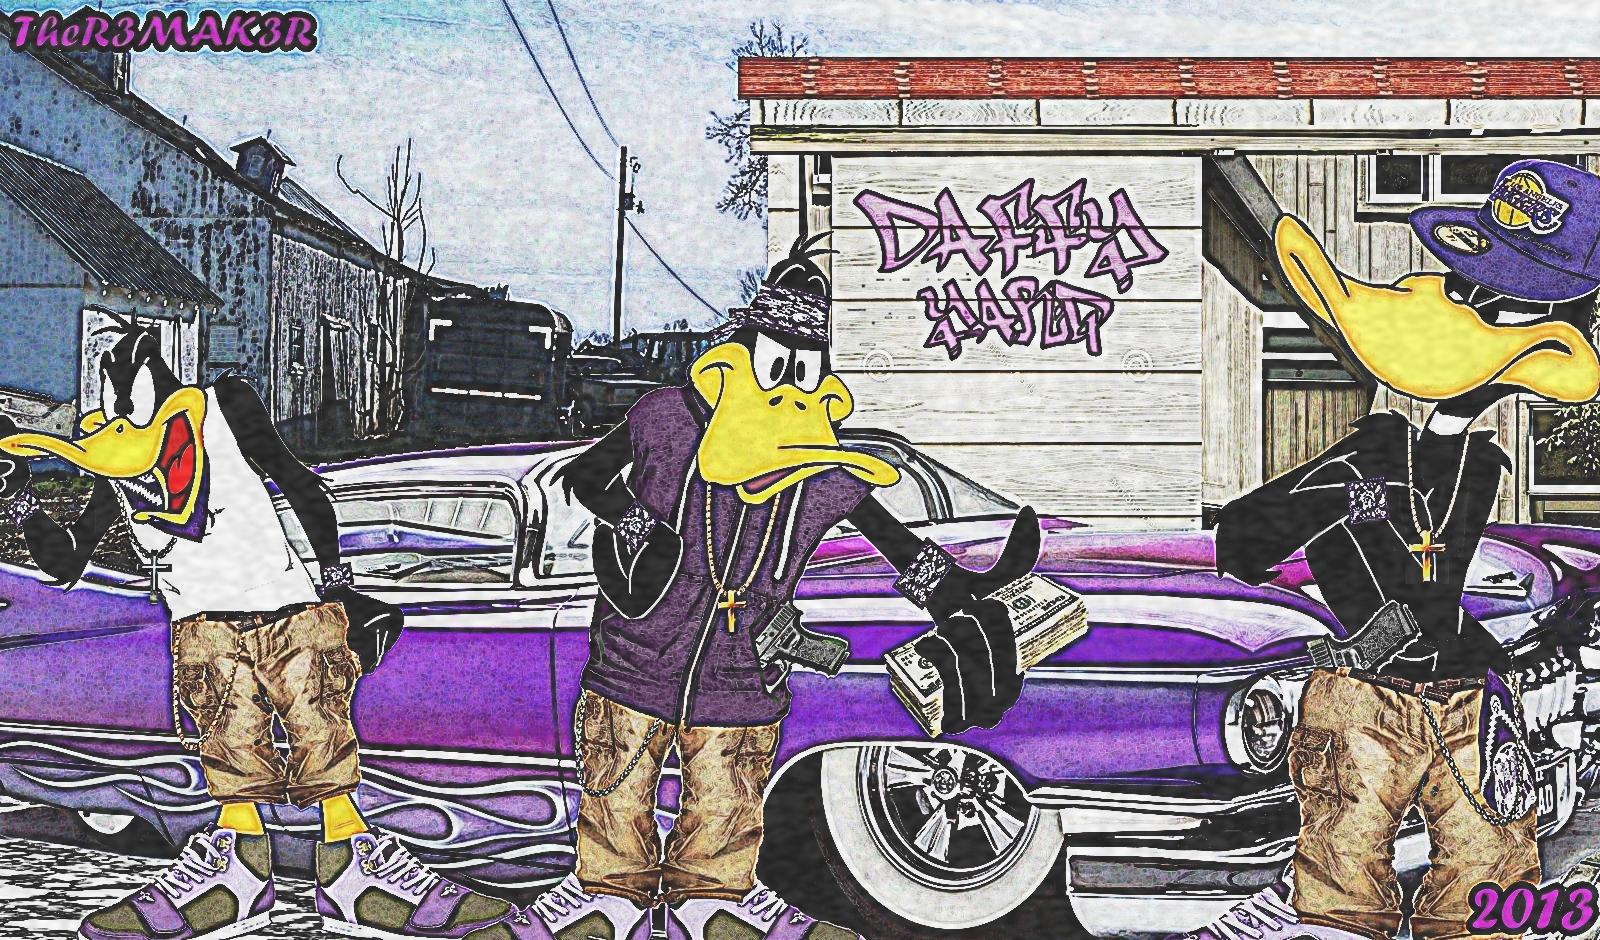 Gangster Daffy Duck Daffy Duck Gang Bangers by